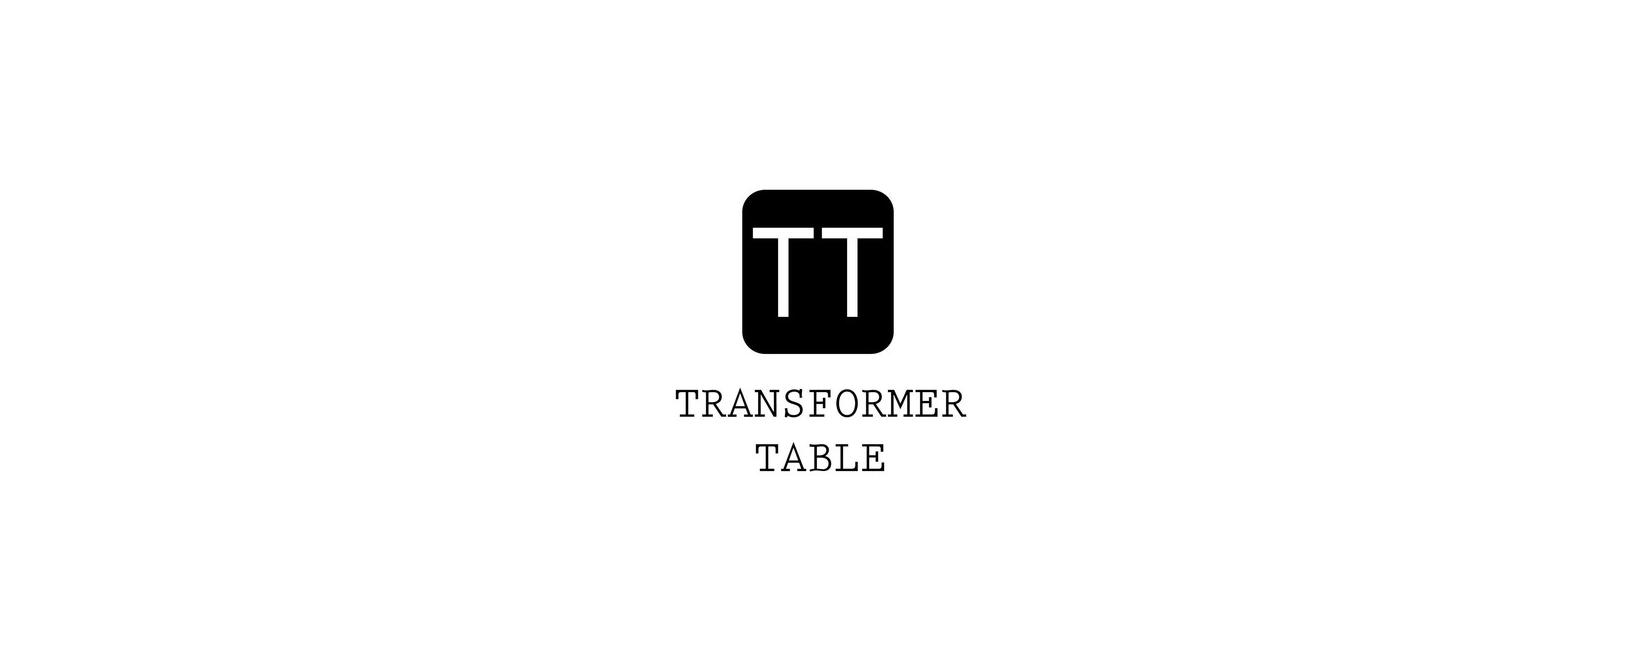 Transformer Table Coupon Code 2021